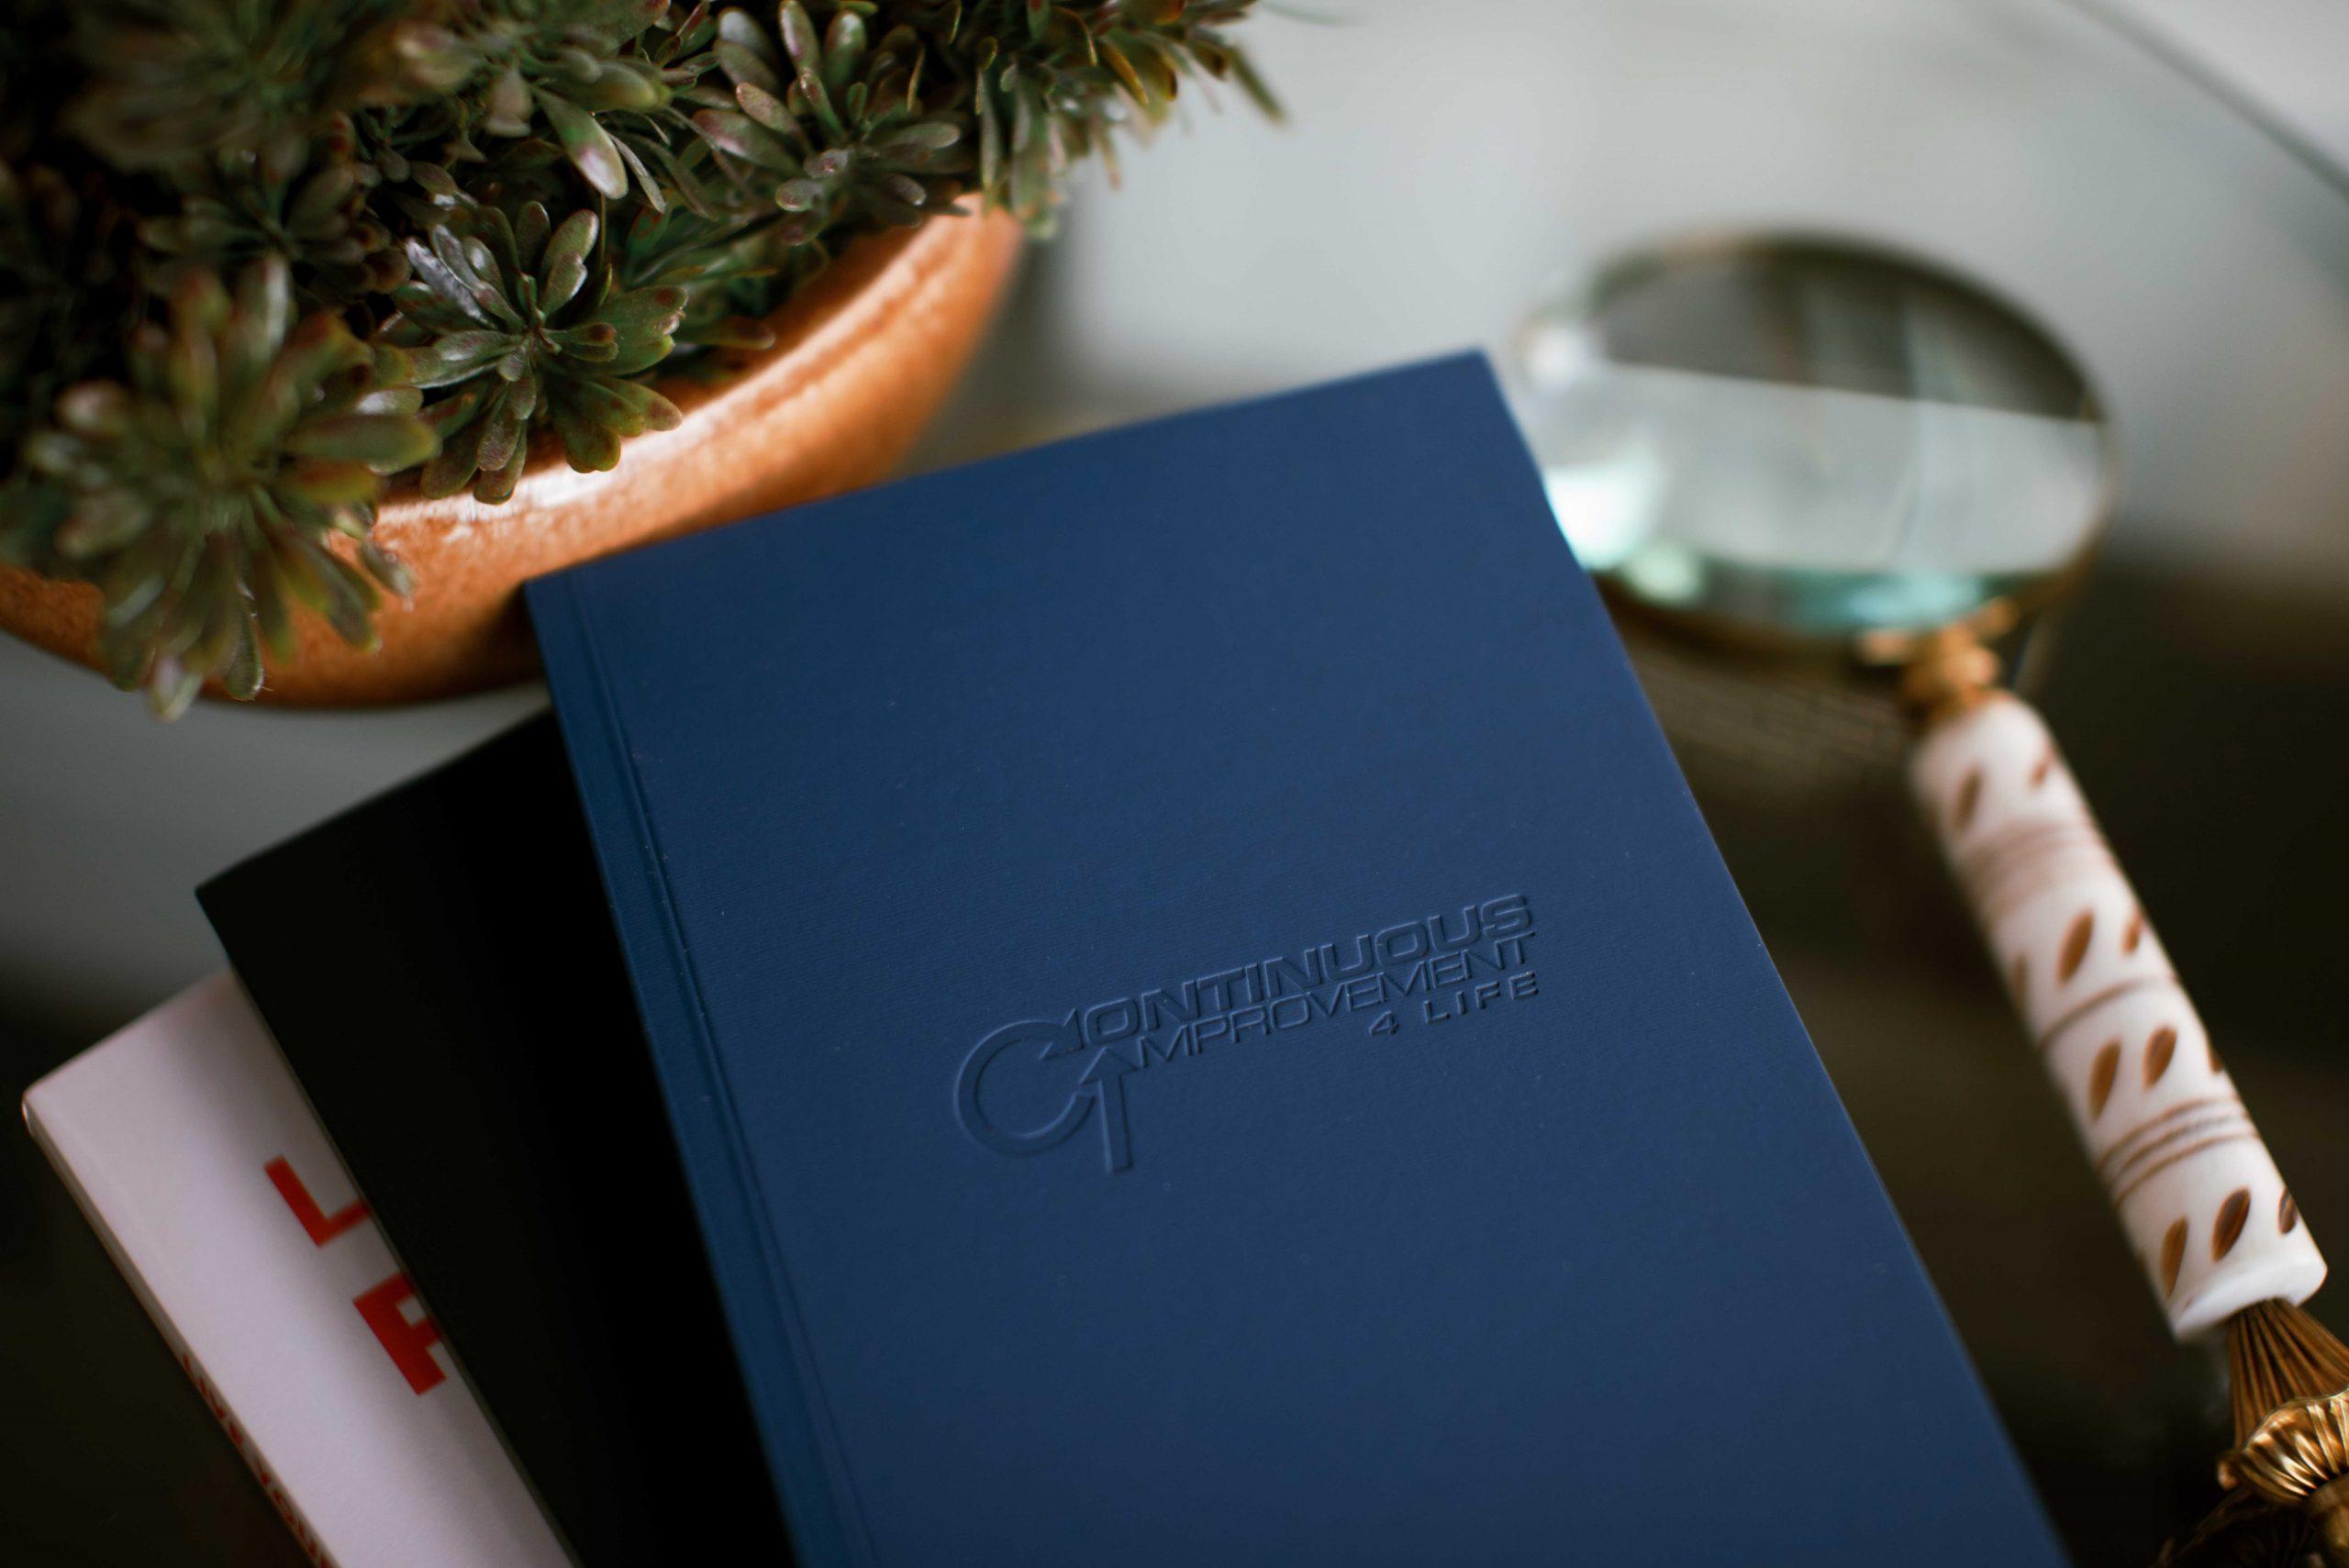 Continuous Improvements 4 Life Journal